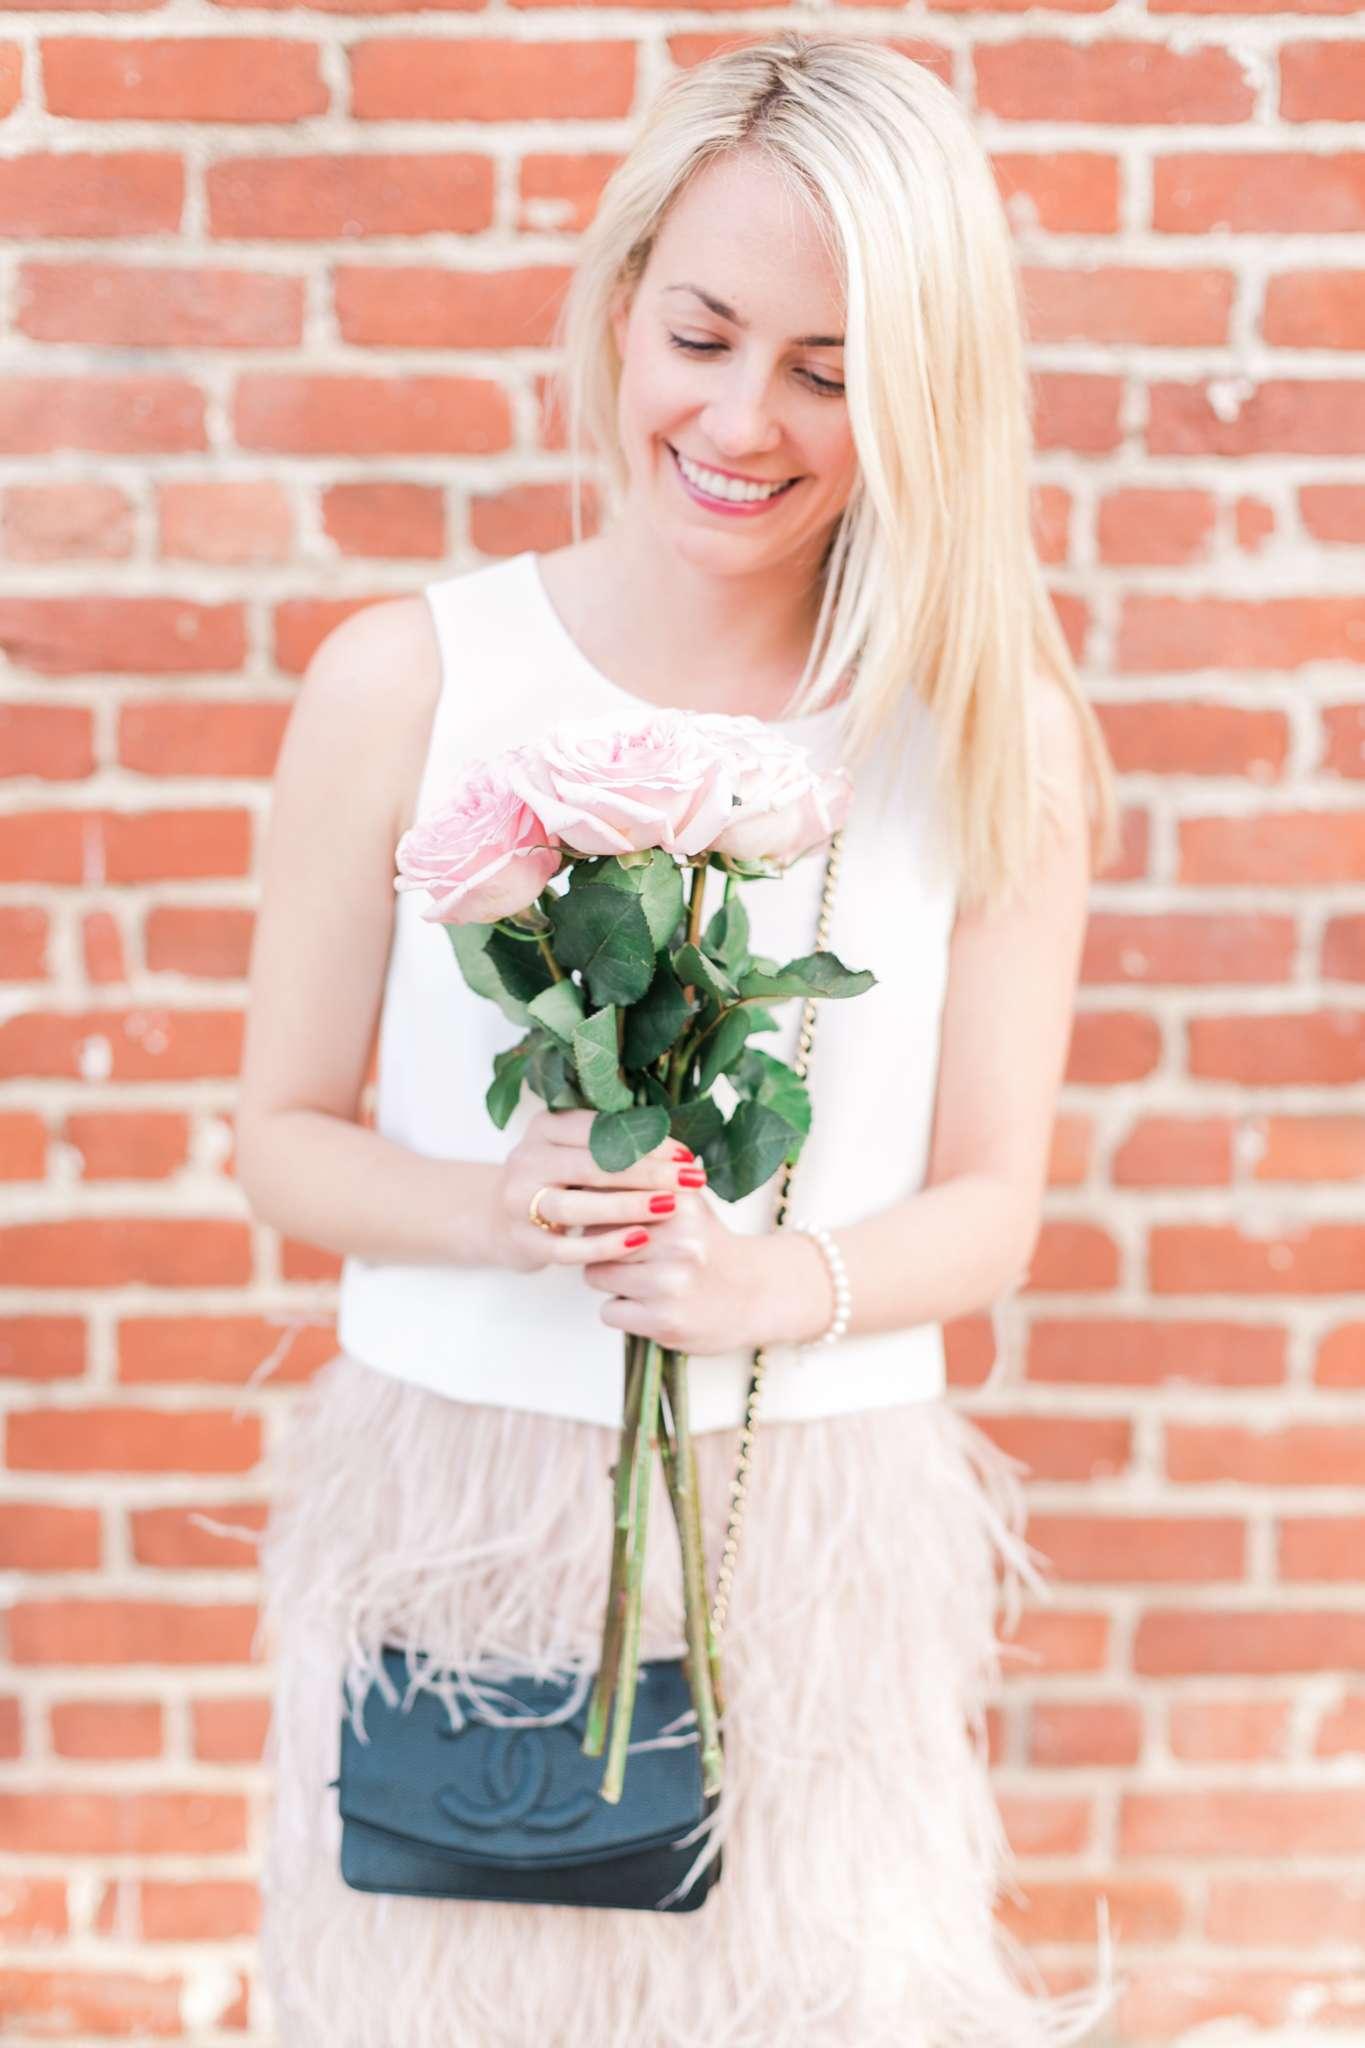 Valentine's Day Dresses on Rhyme & Reason